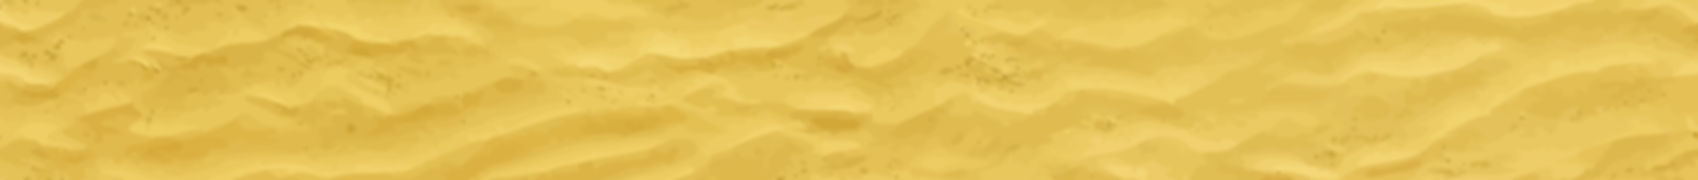 Sand_edited_edited.jpg